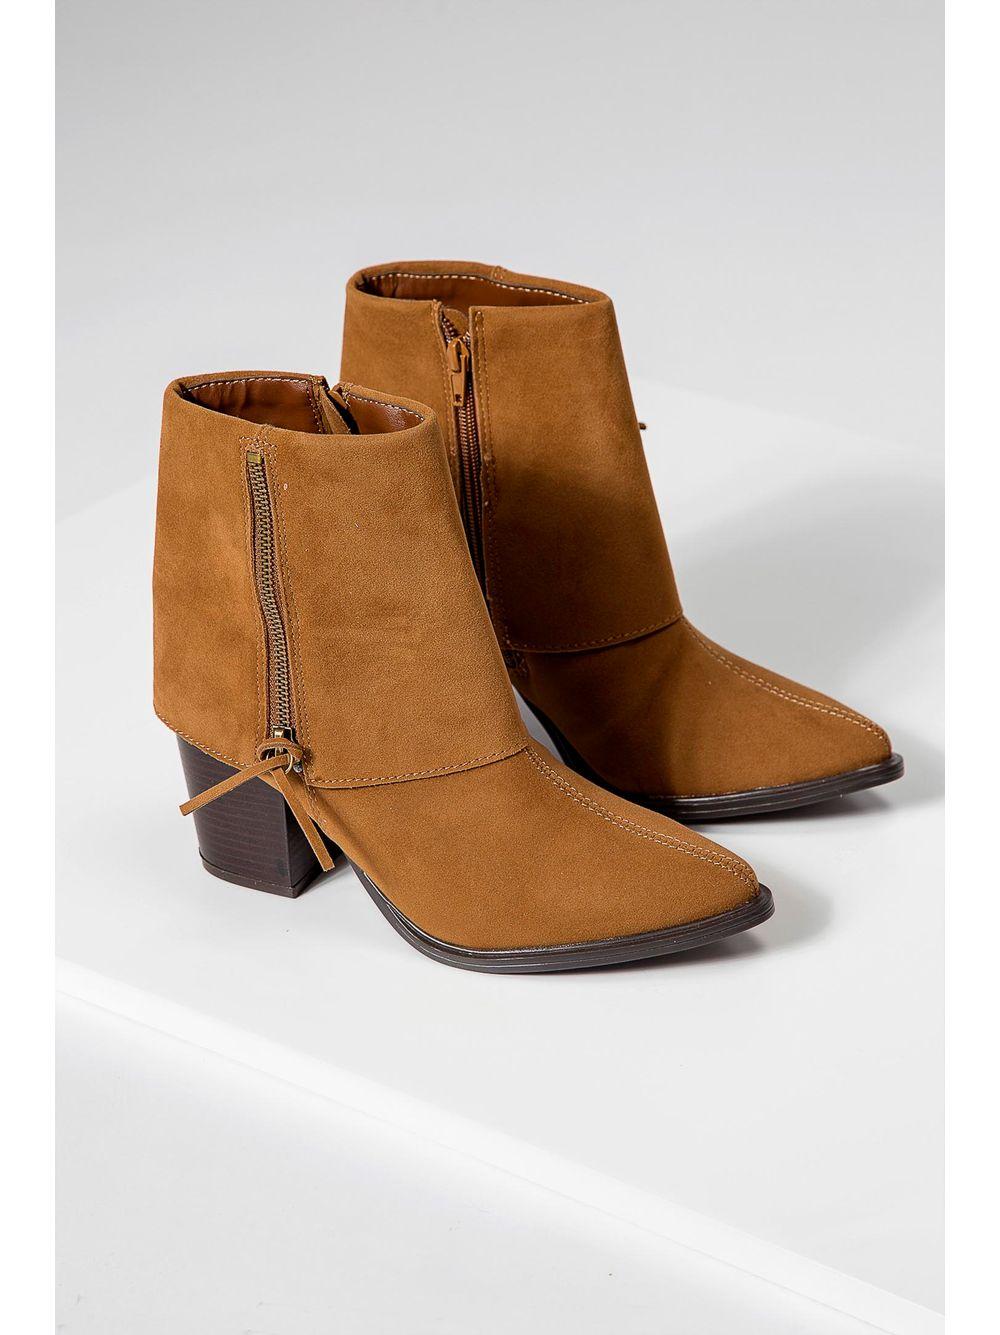 d9f90a99f pittol · Calçado Feminino · Bota · Ankle Boot. 10%. Previous